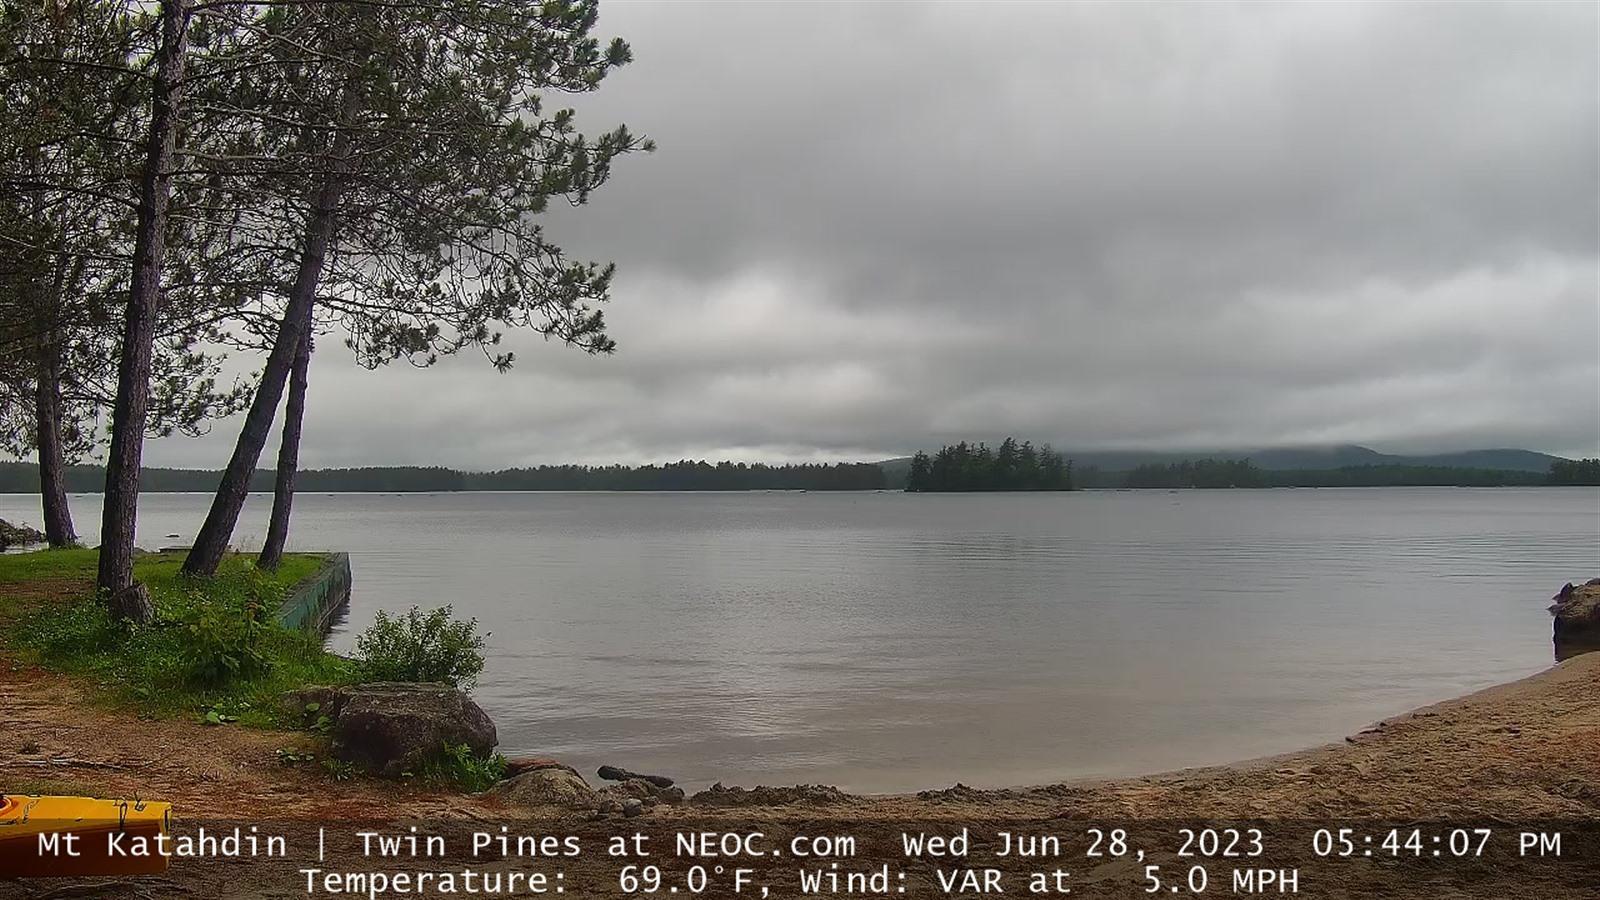 Webcam Norcross › North: Mt Katahdin